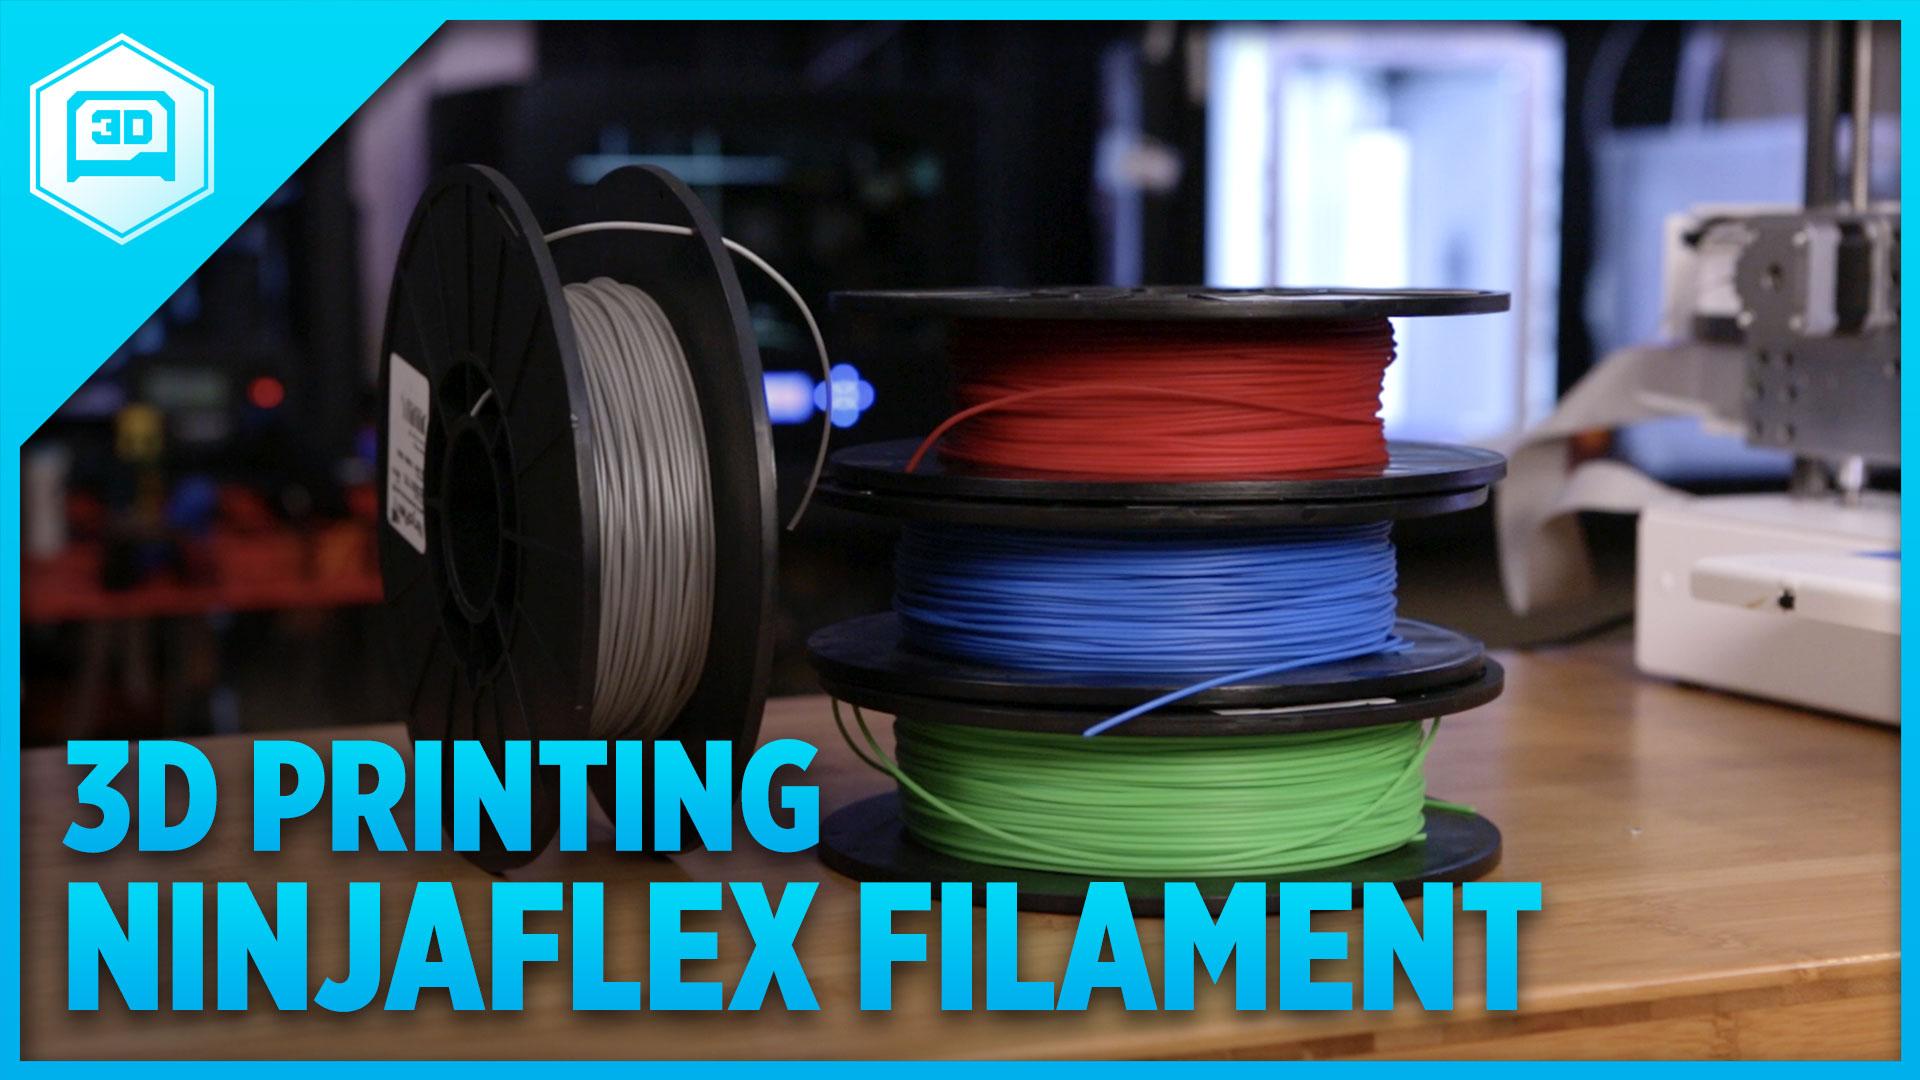 3d_printing_ninjaflex-thumb.jpg